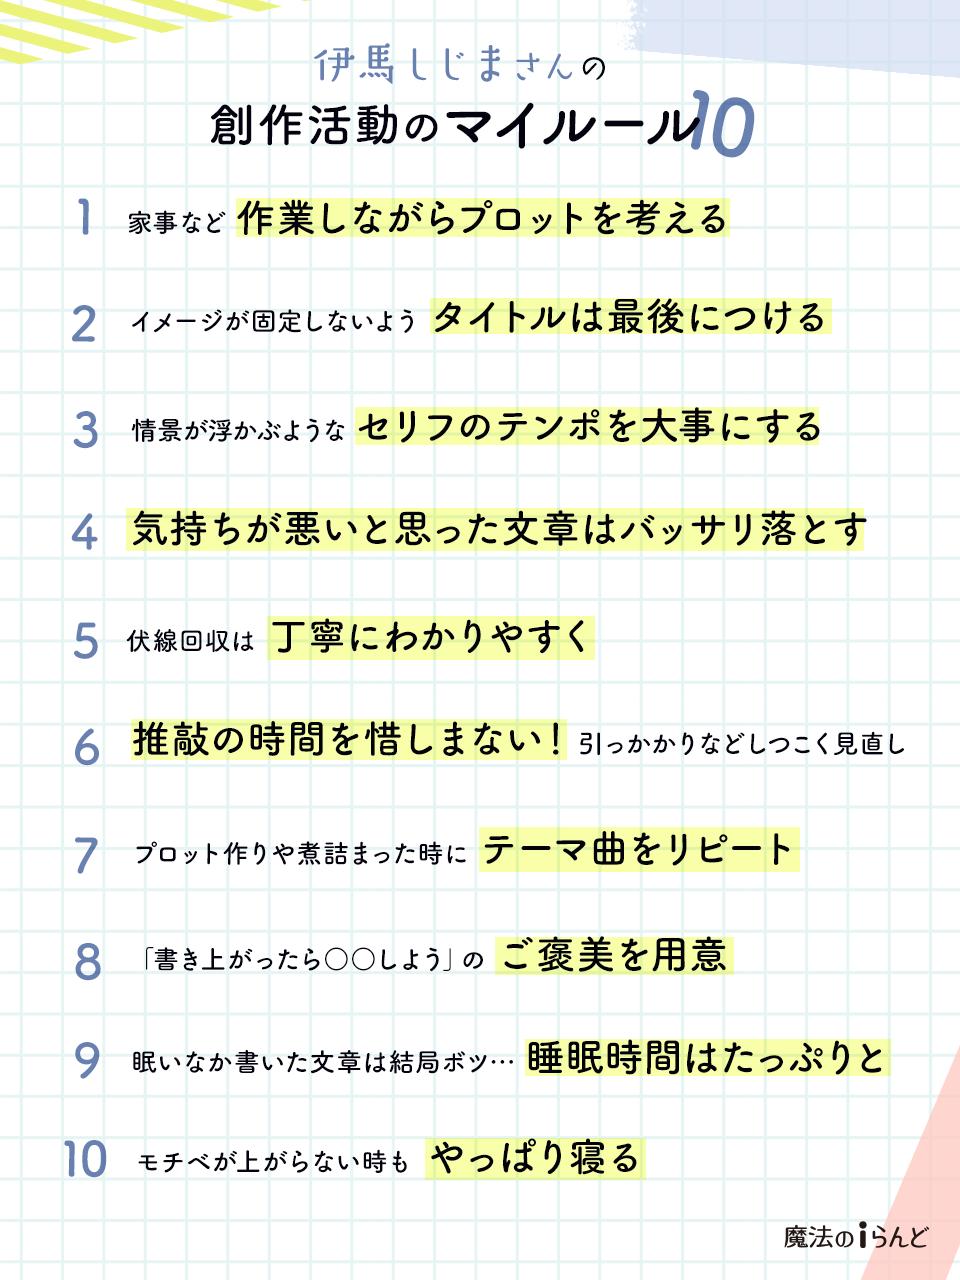 https://storage.googleapis.com/blog-info/entry/2021/08/06-myrule-ima_twitter.png